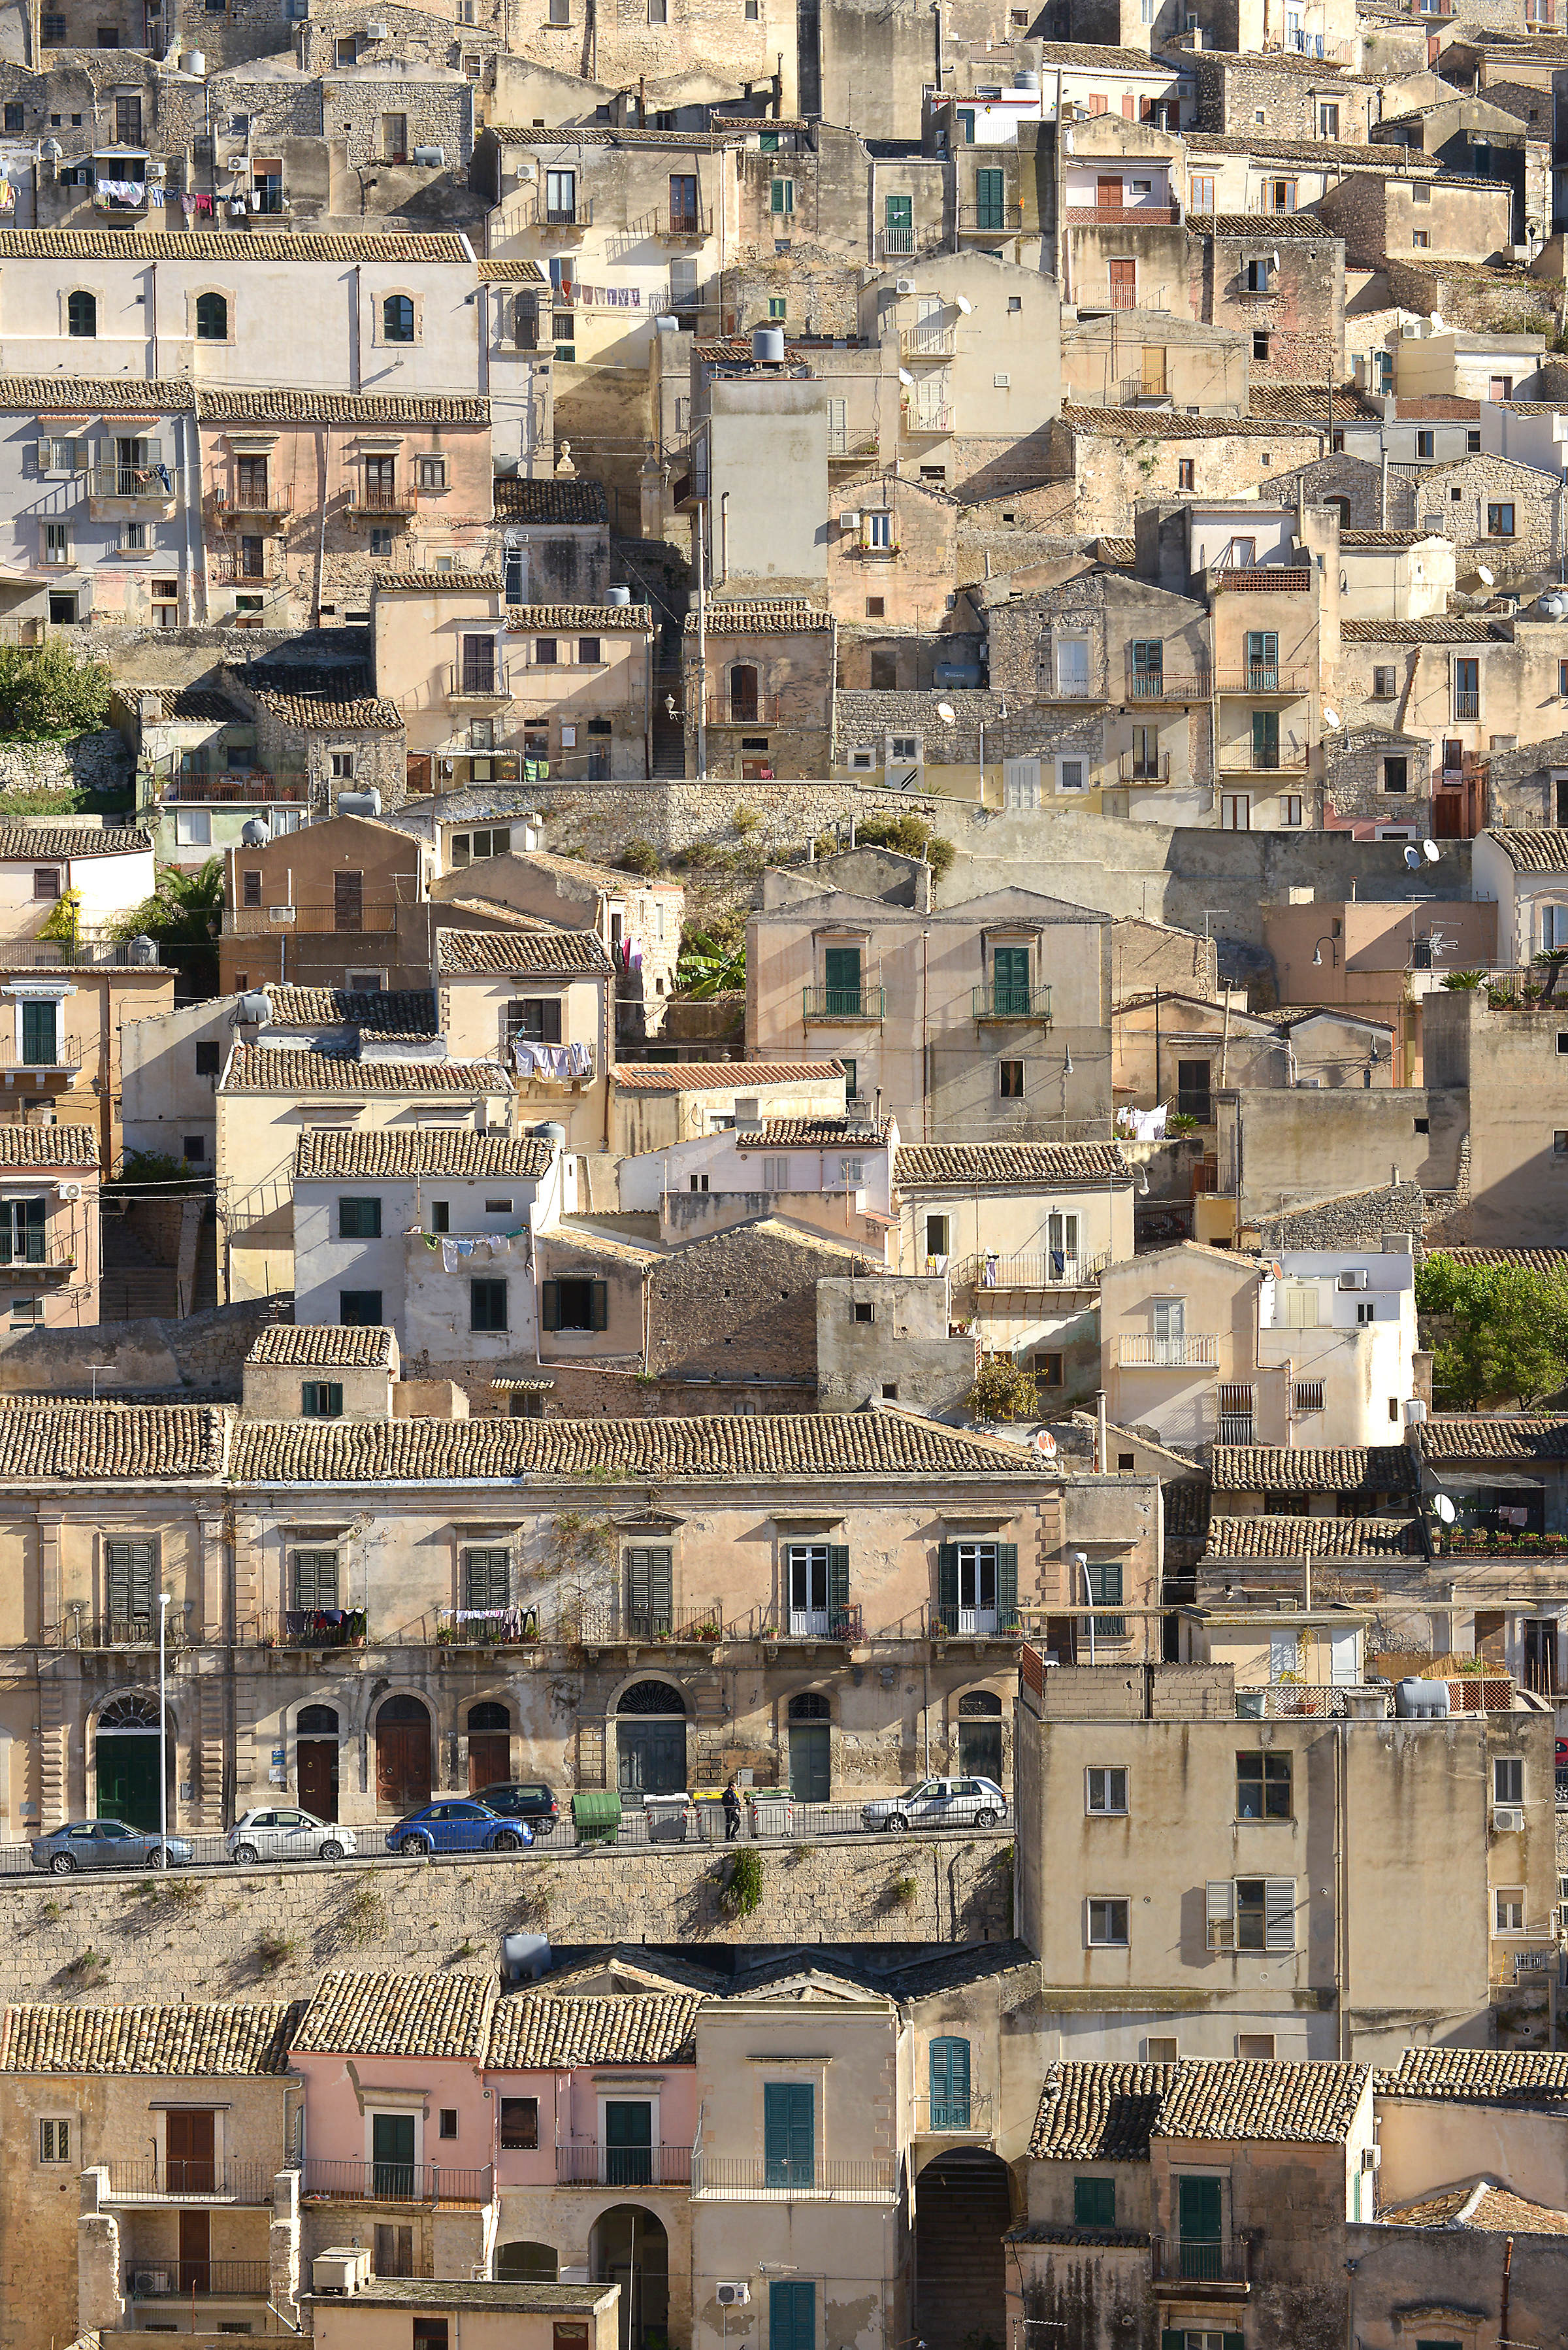 Modica, vanhakaupunki, Sisilia, Italia